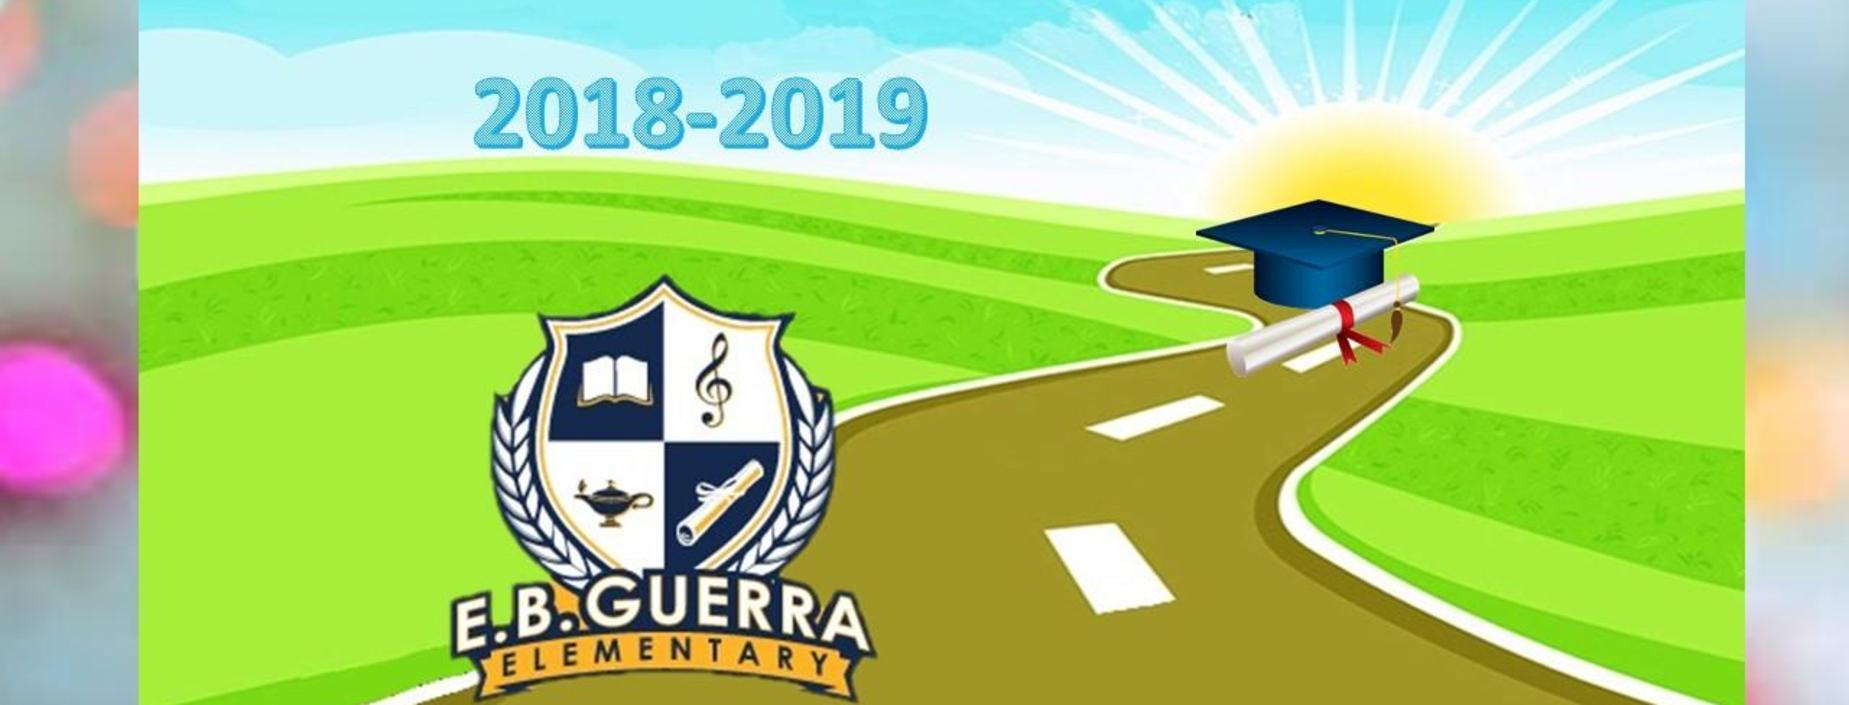 image of Guerra logo and graduation cap on a sunrise image